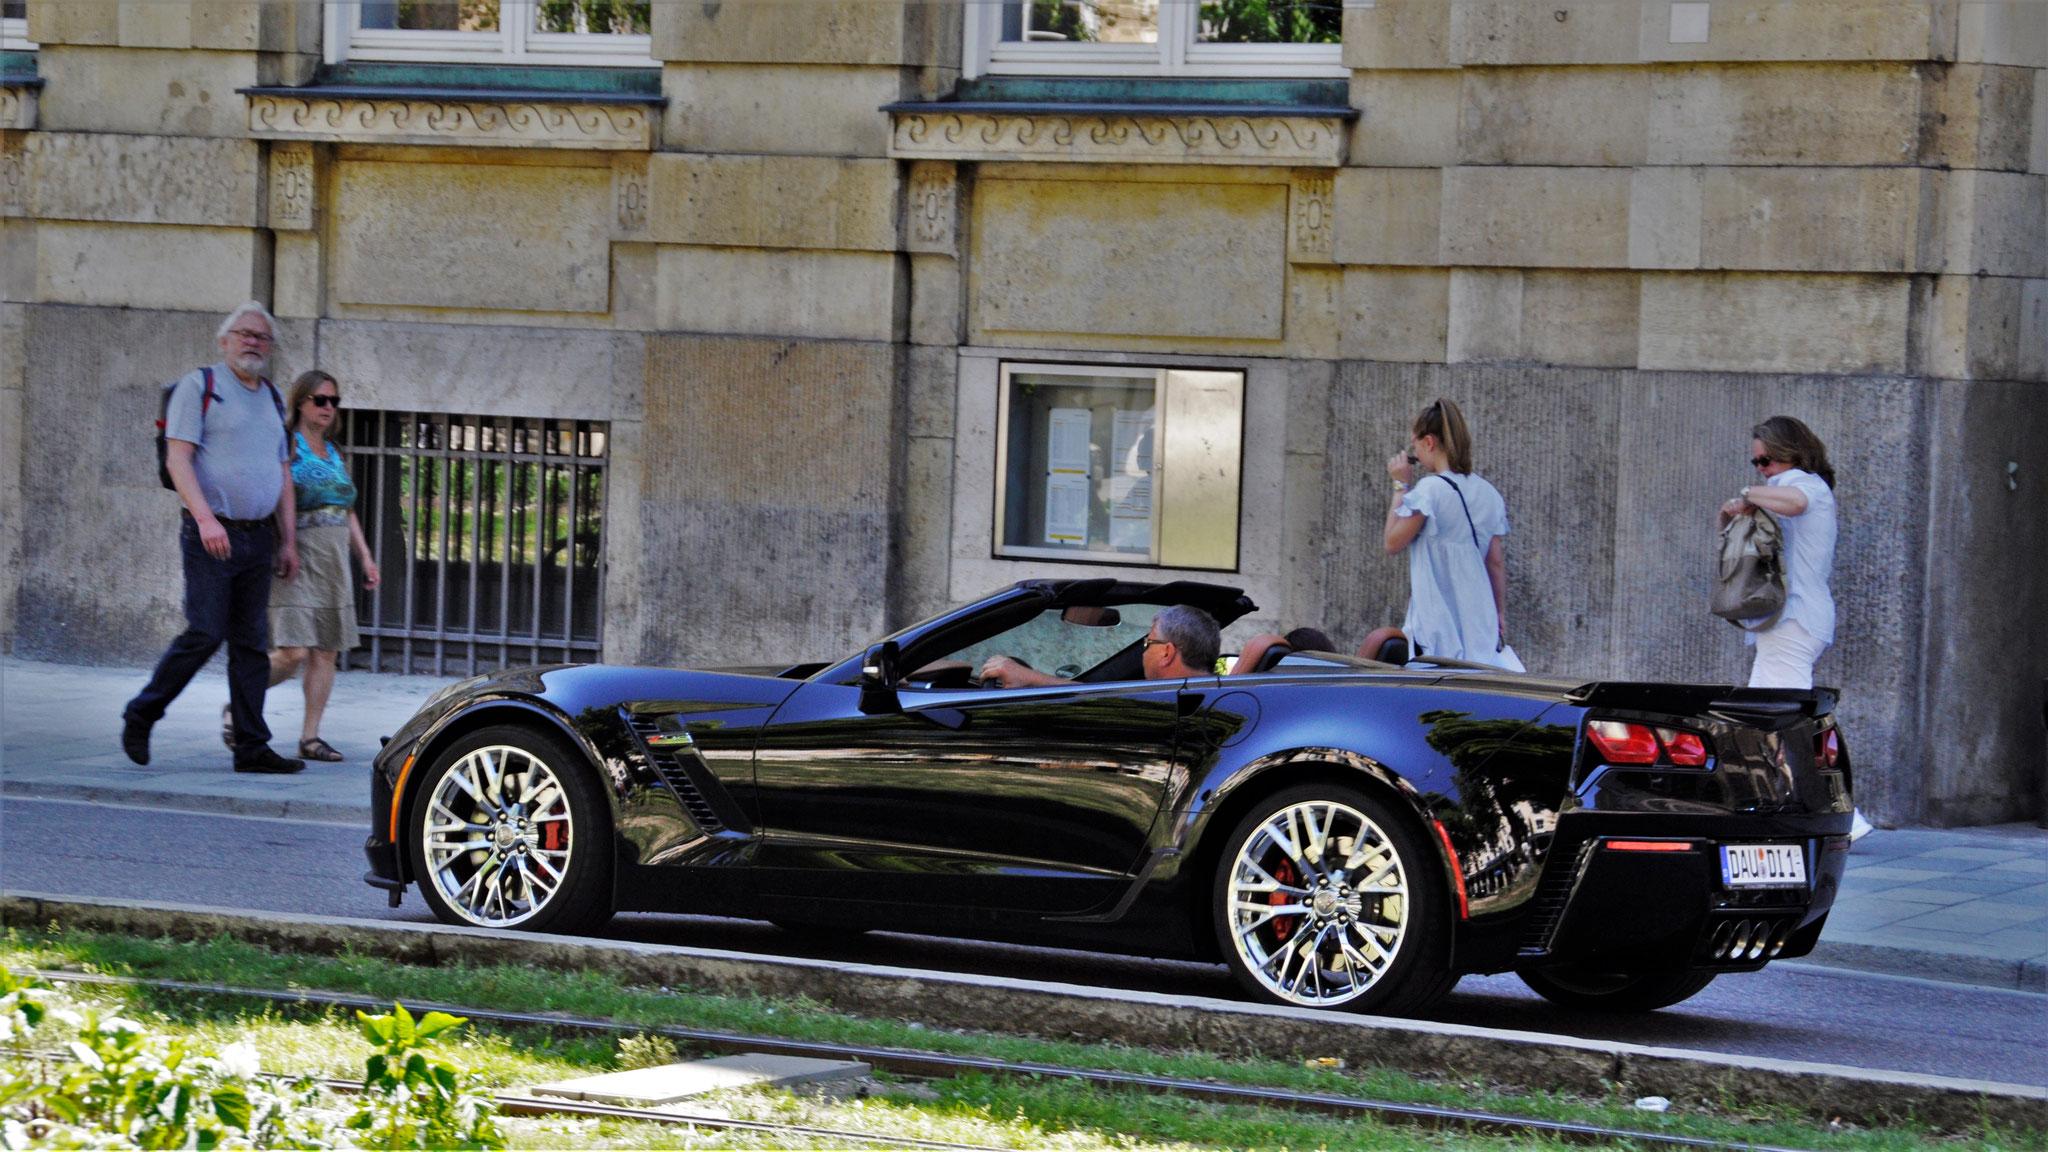 Chevrolet Corvette C7 Z06 Convertible - DAU-DI-1